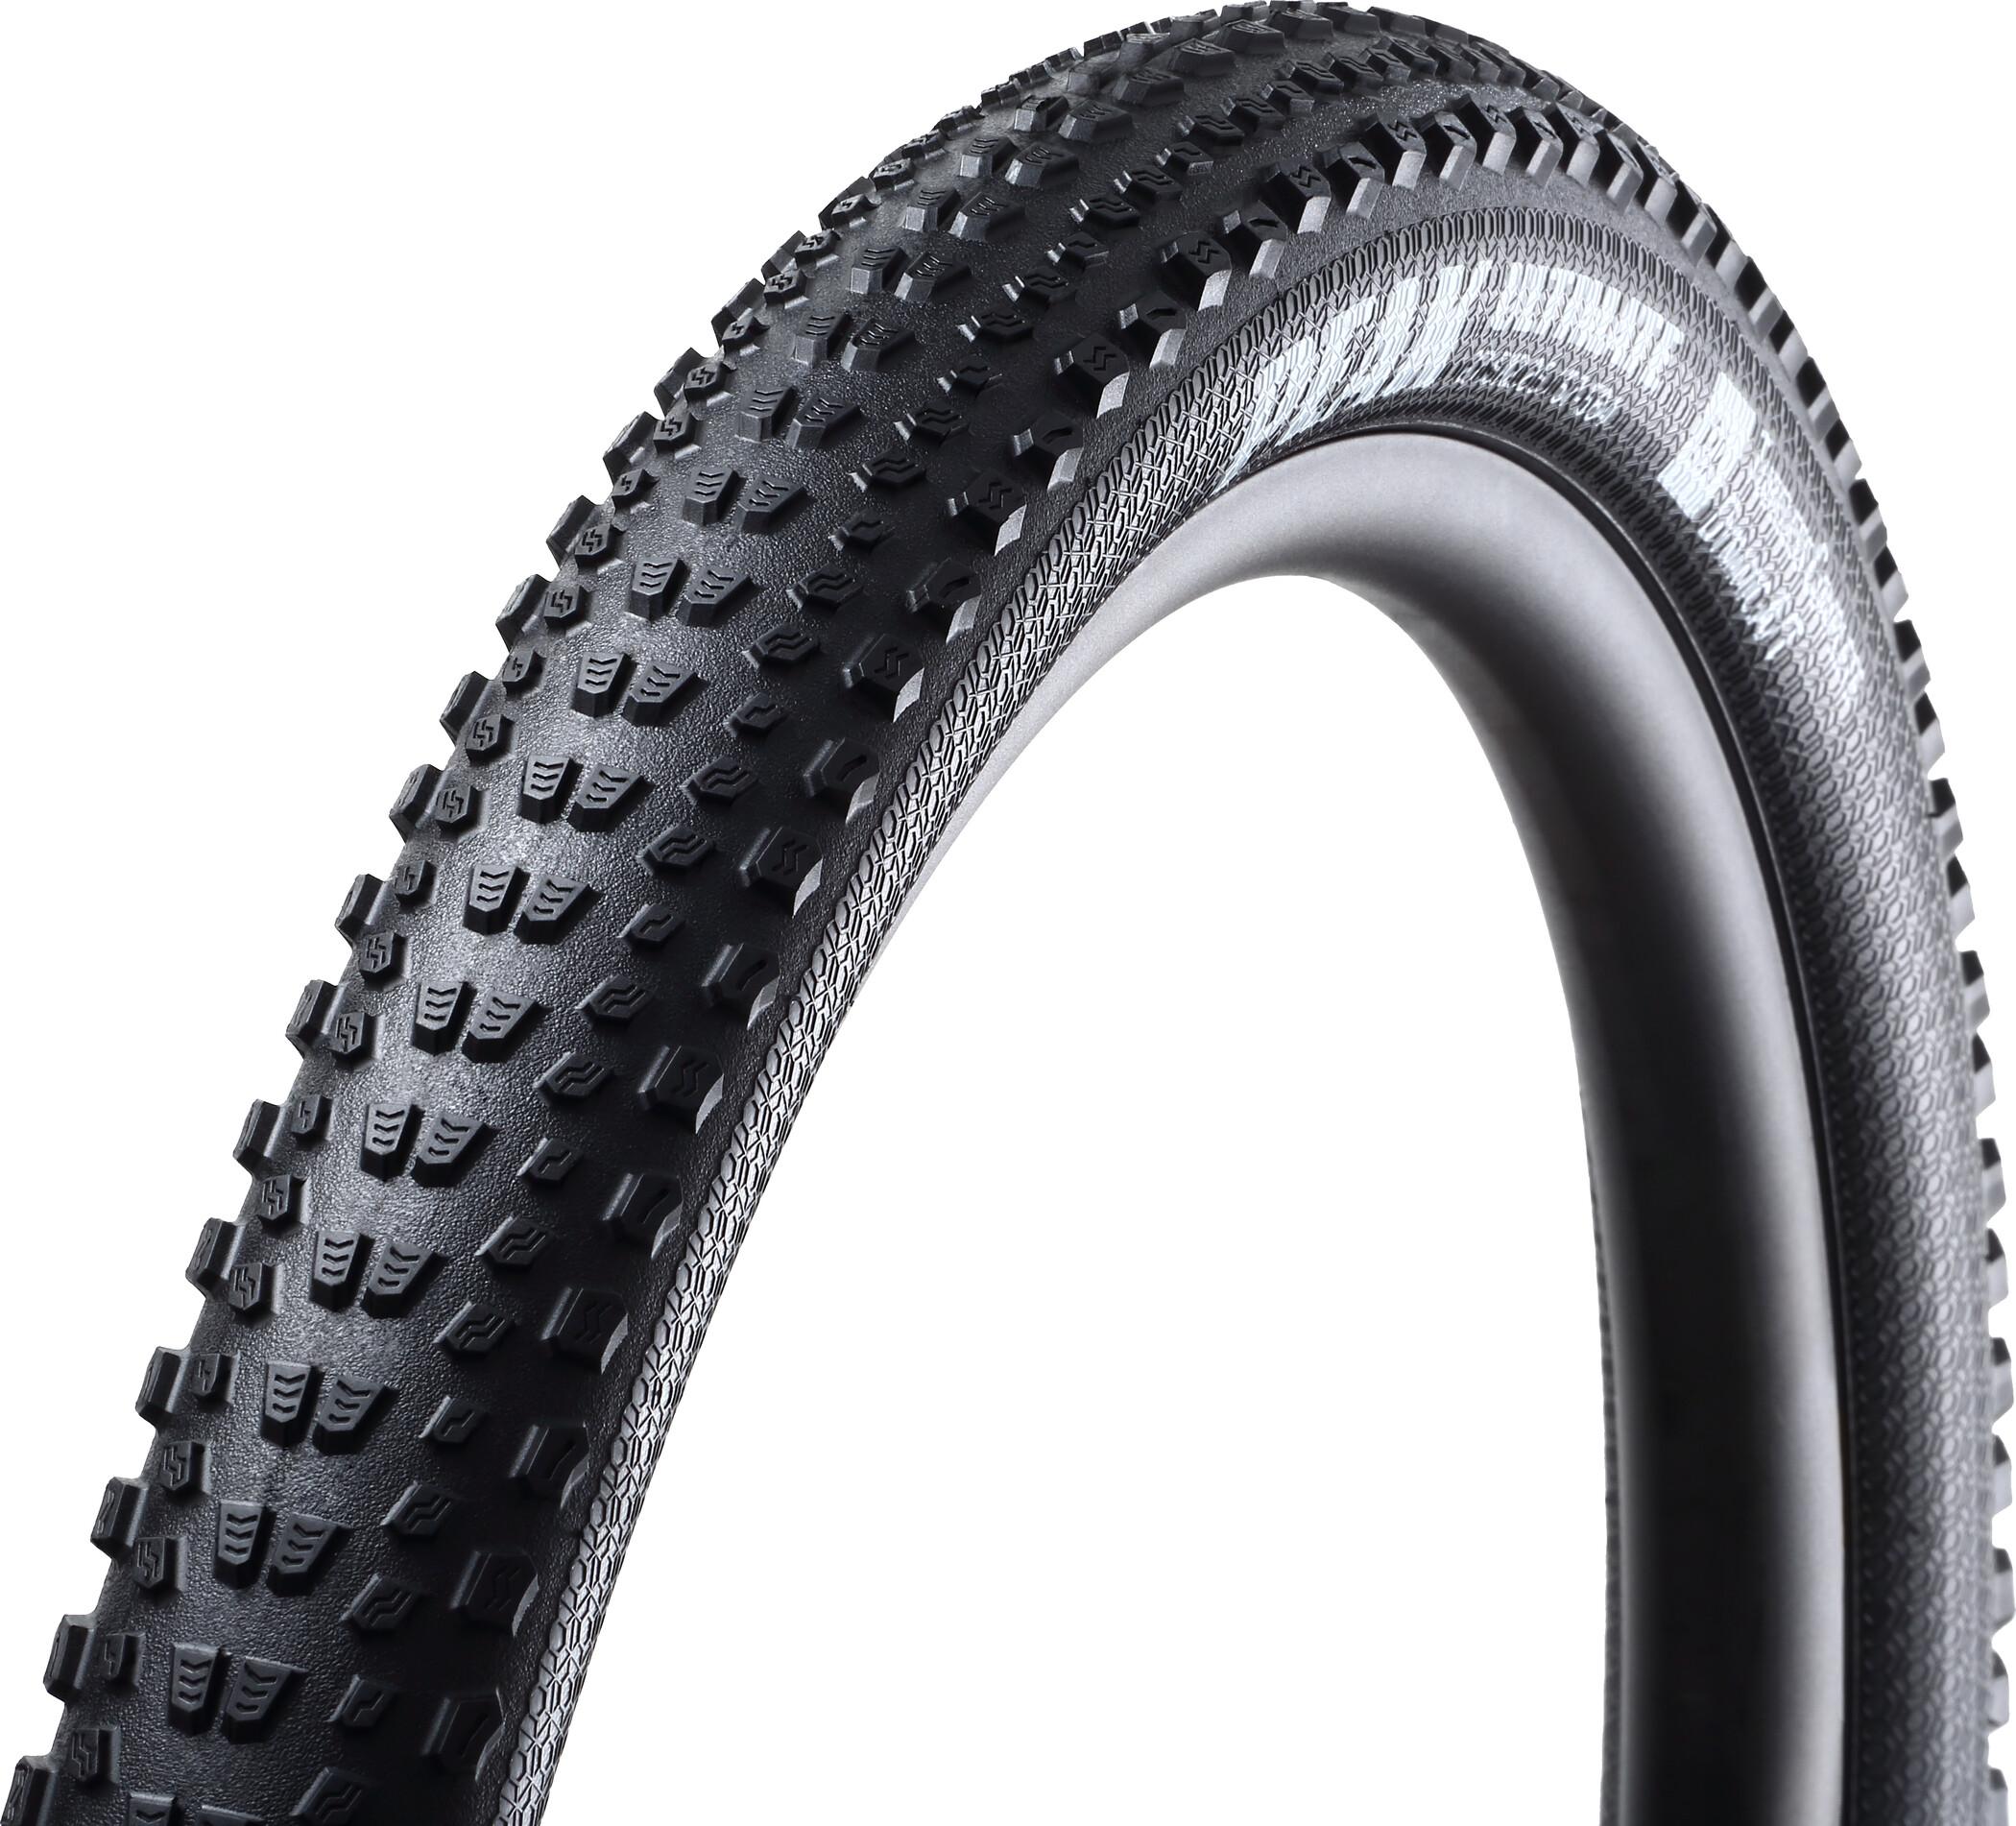 Goodyear Peak Ultimate Foldedæk 57-622 Tubeless Complete Dynamic A/T e25, black (2019)   Tyres